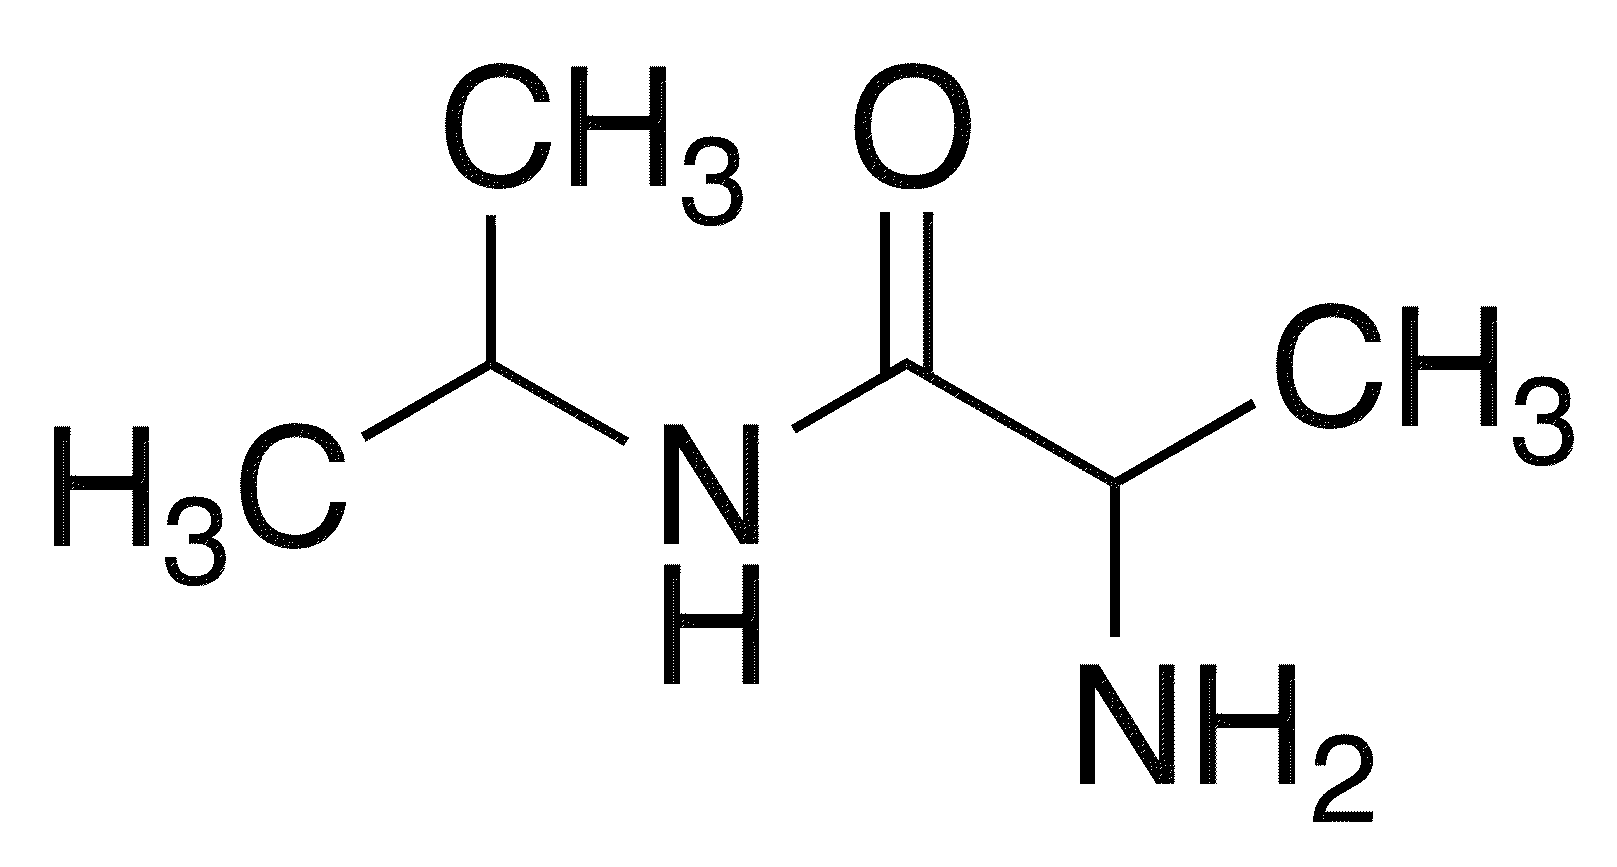 2-Amino-N-isopropyl-DL-propanamide